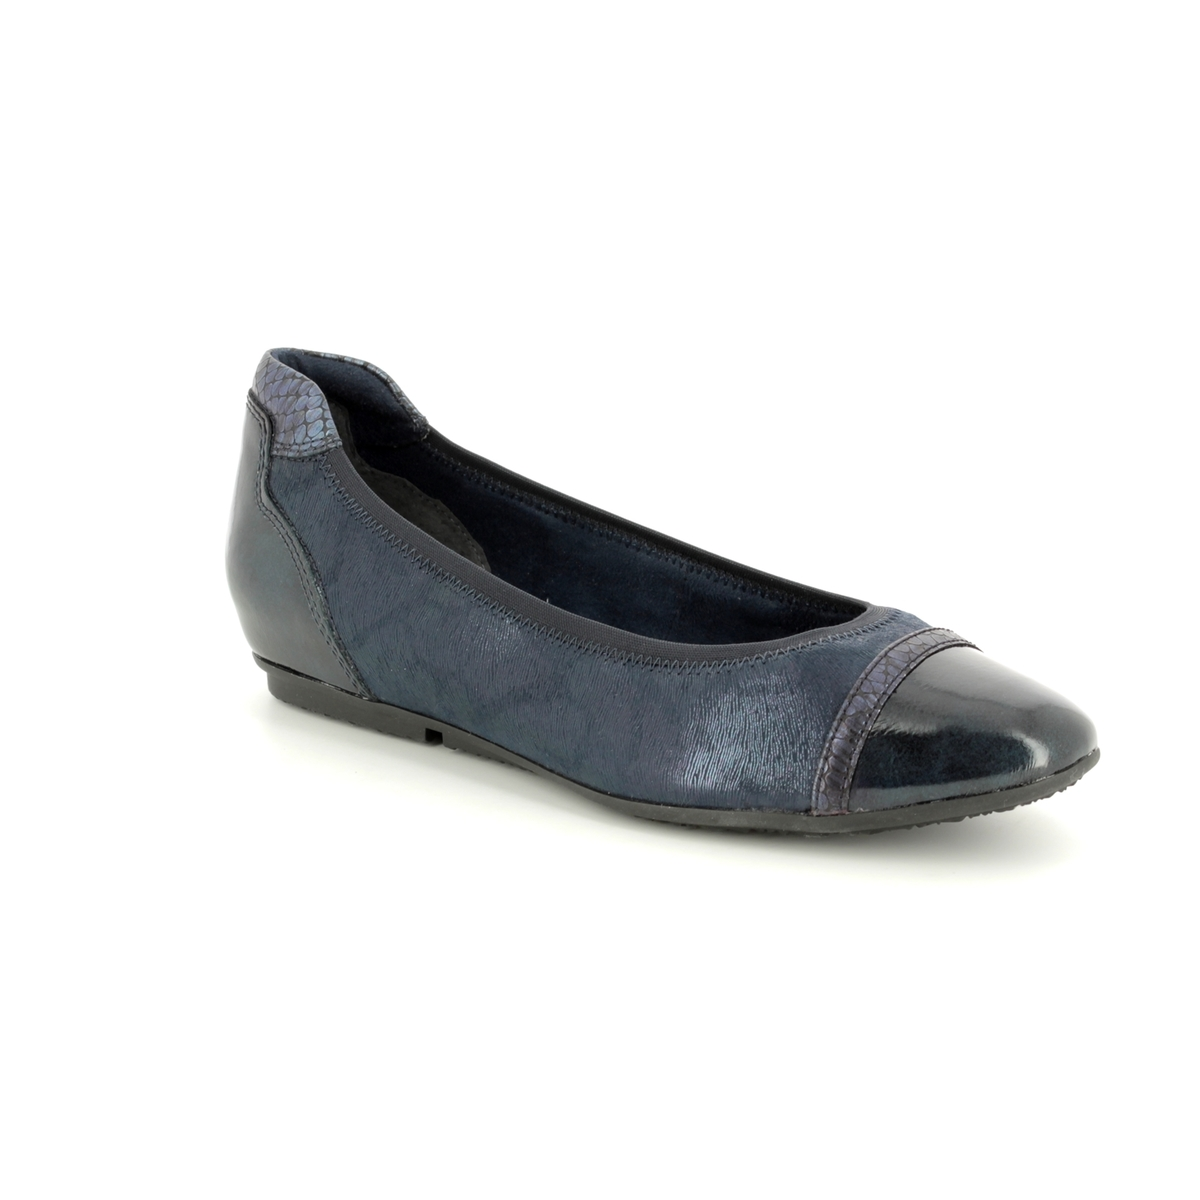 info for 2c668 f5135 22139/20/890 Joya 81 at Begg Shoes & Bags